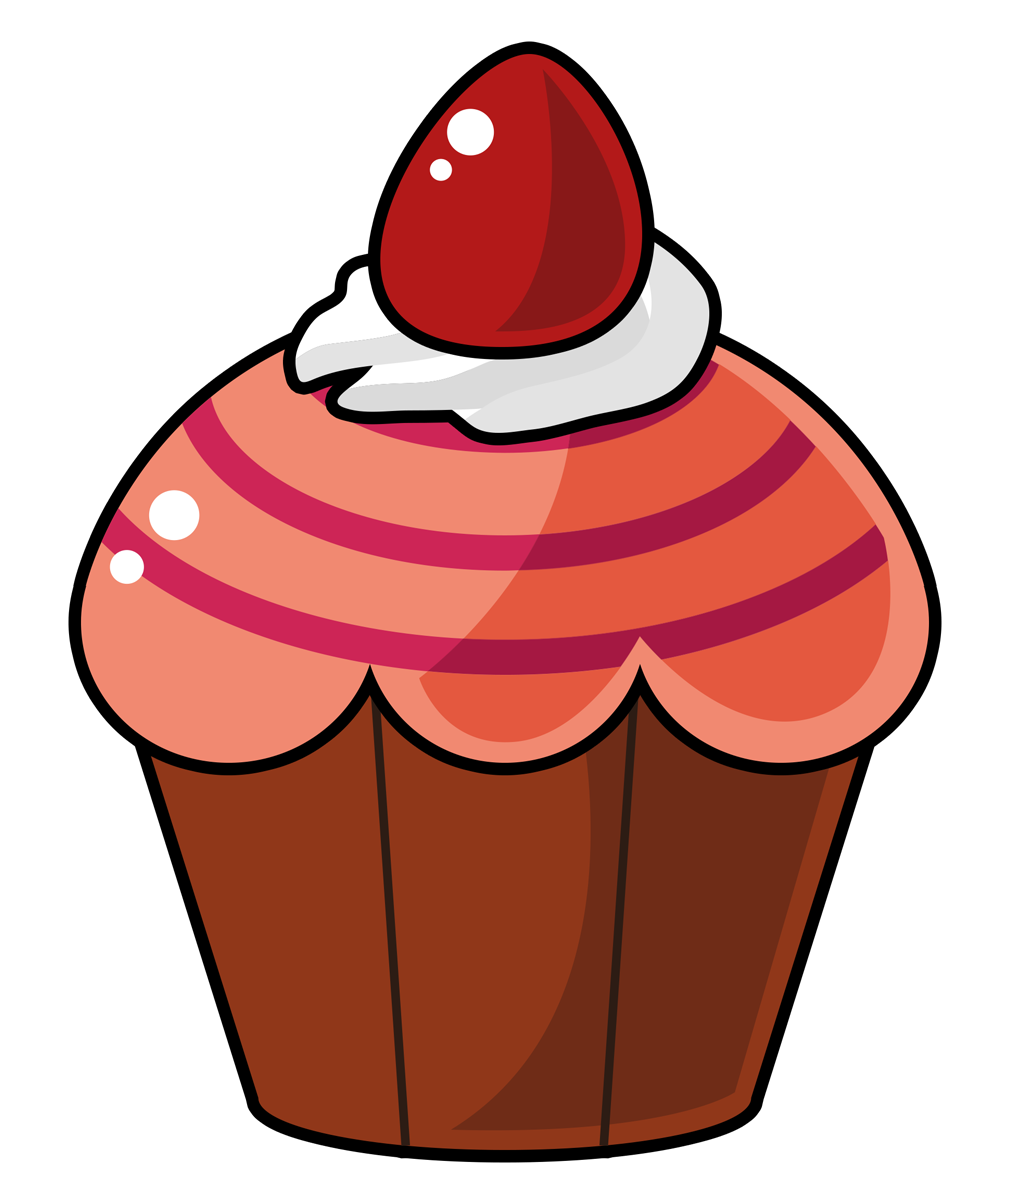 Cartoon cupcake clipart clip art freeuse library Cupcake free to use clip art 2 - Cliparting.com clip art freeuse library